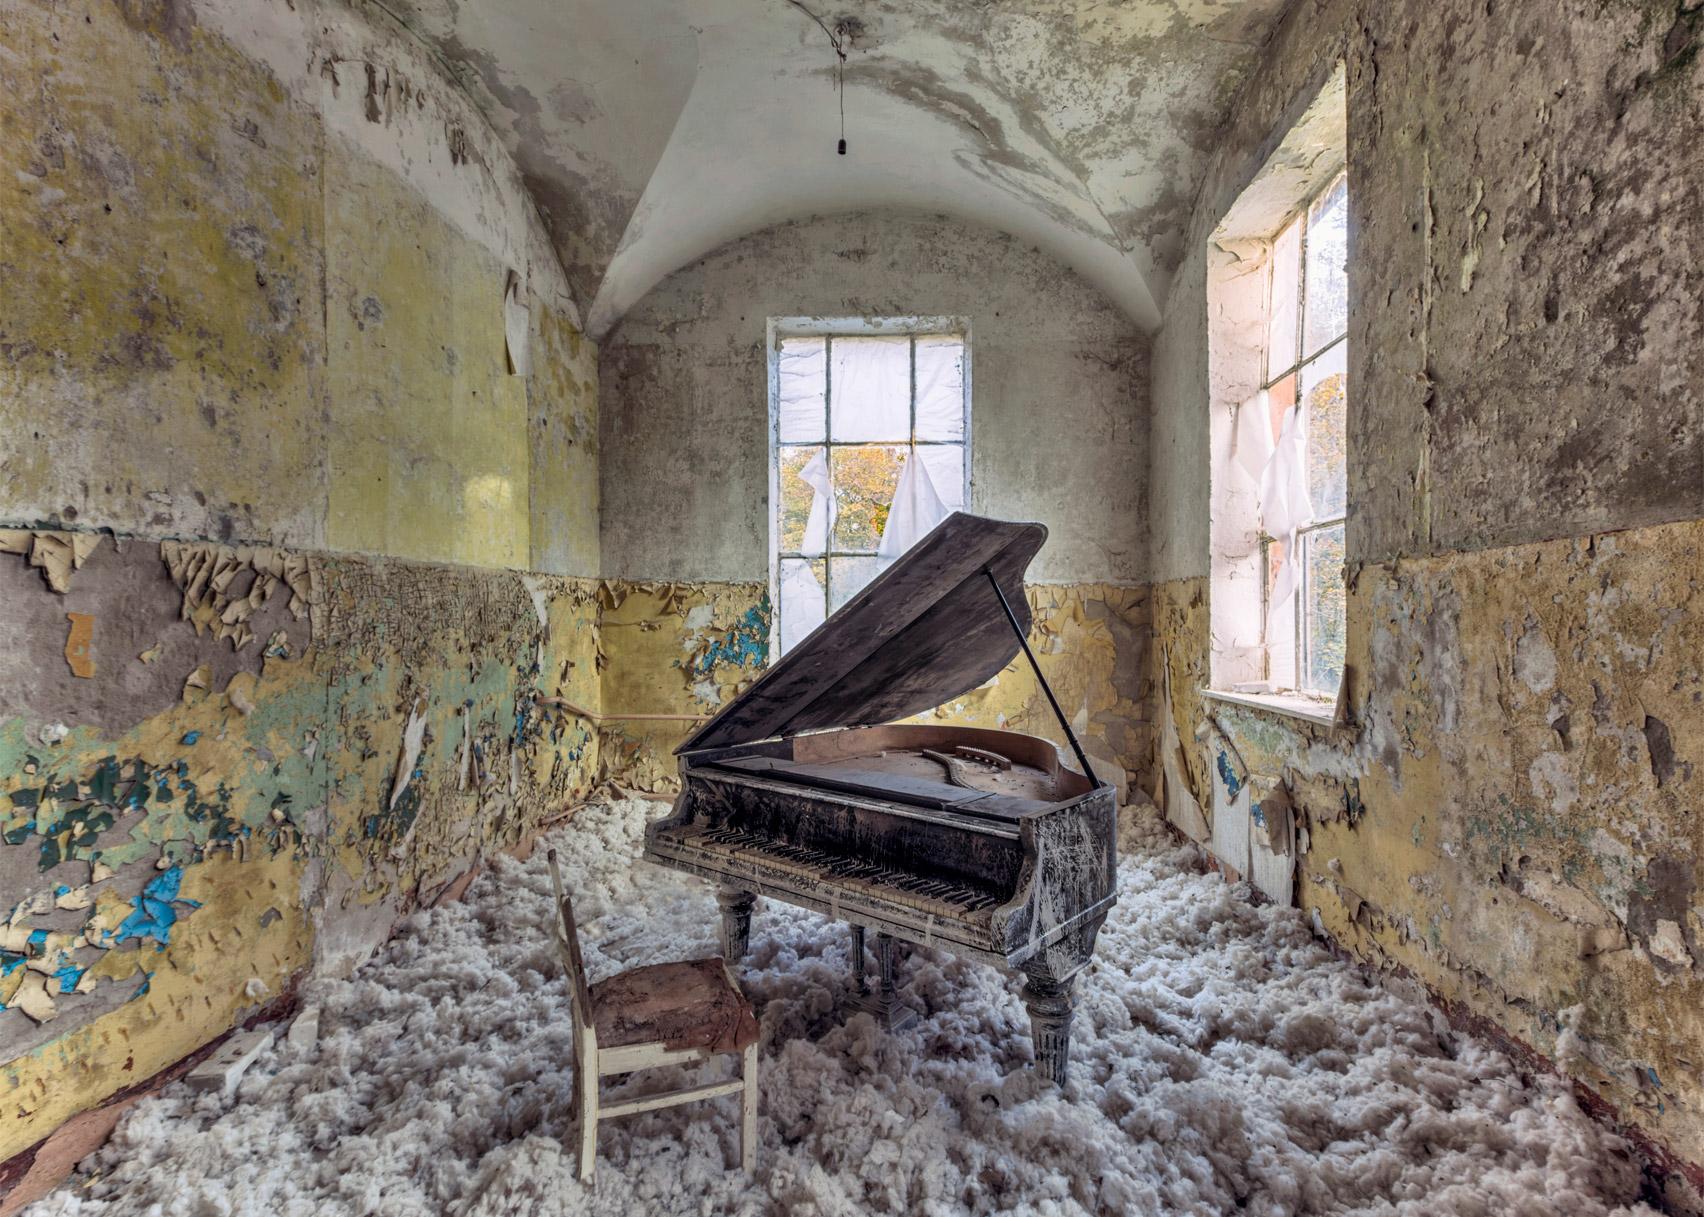 Christian Richter photography